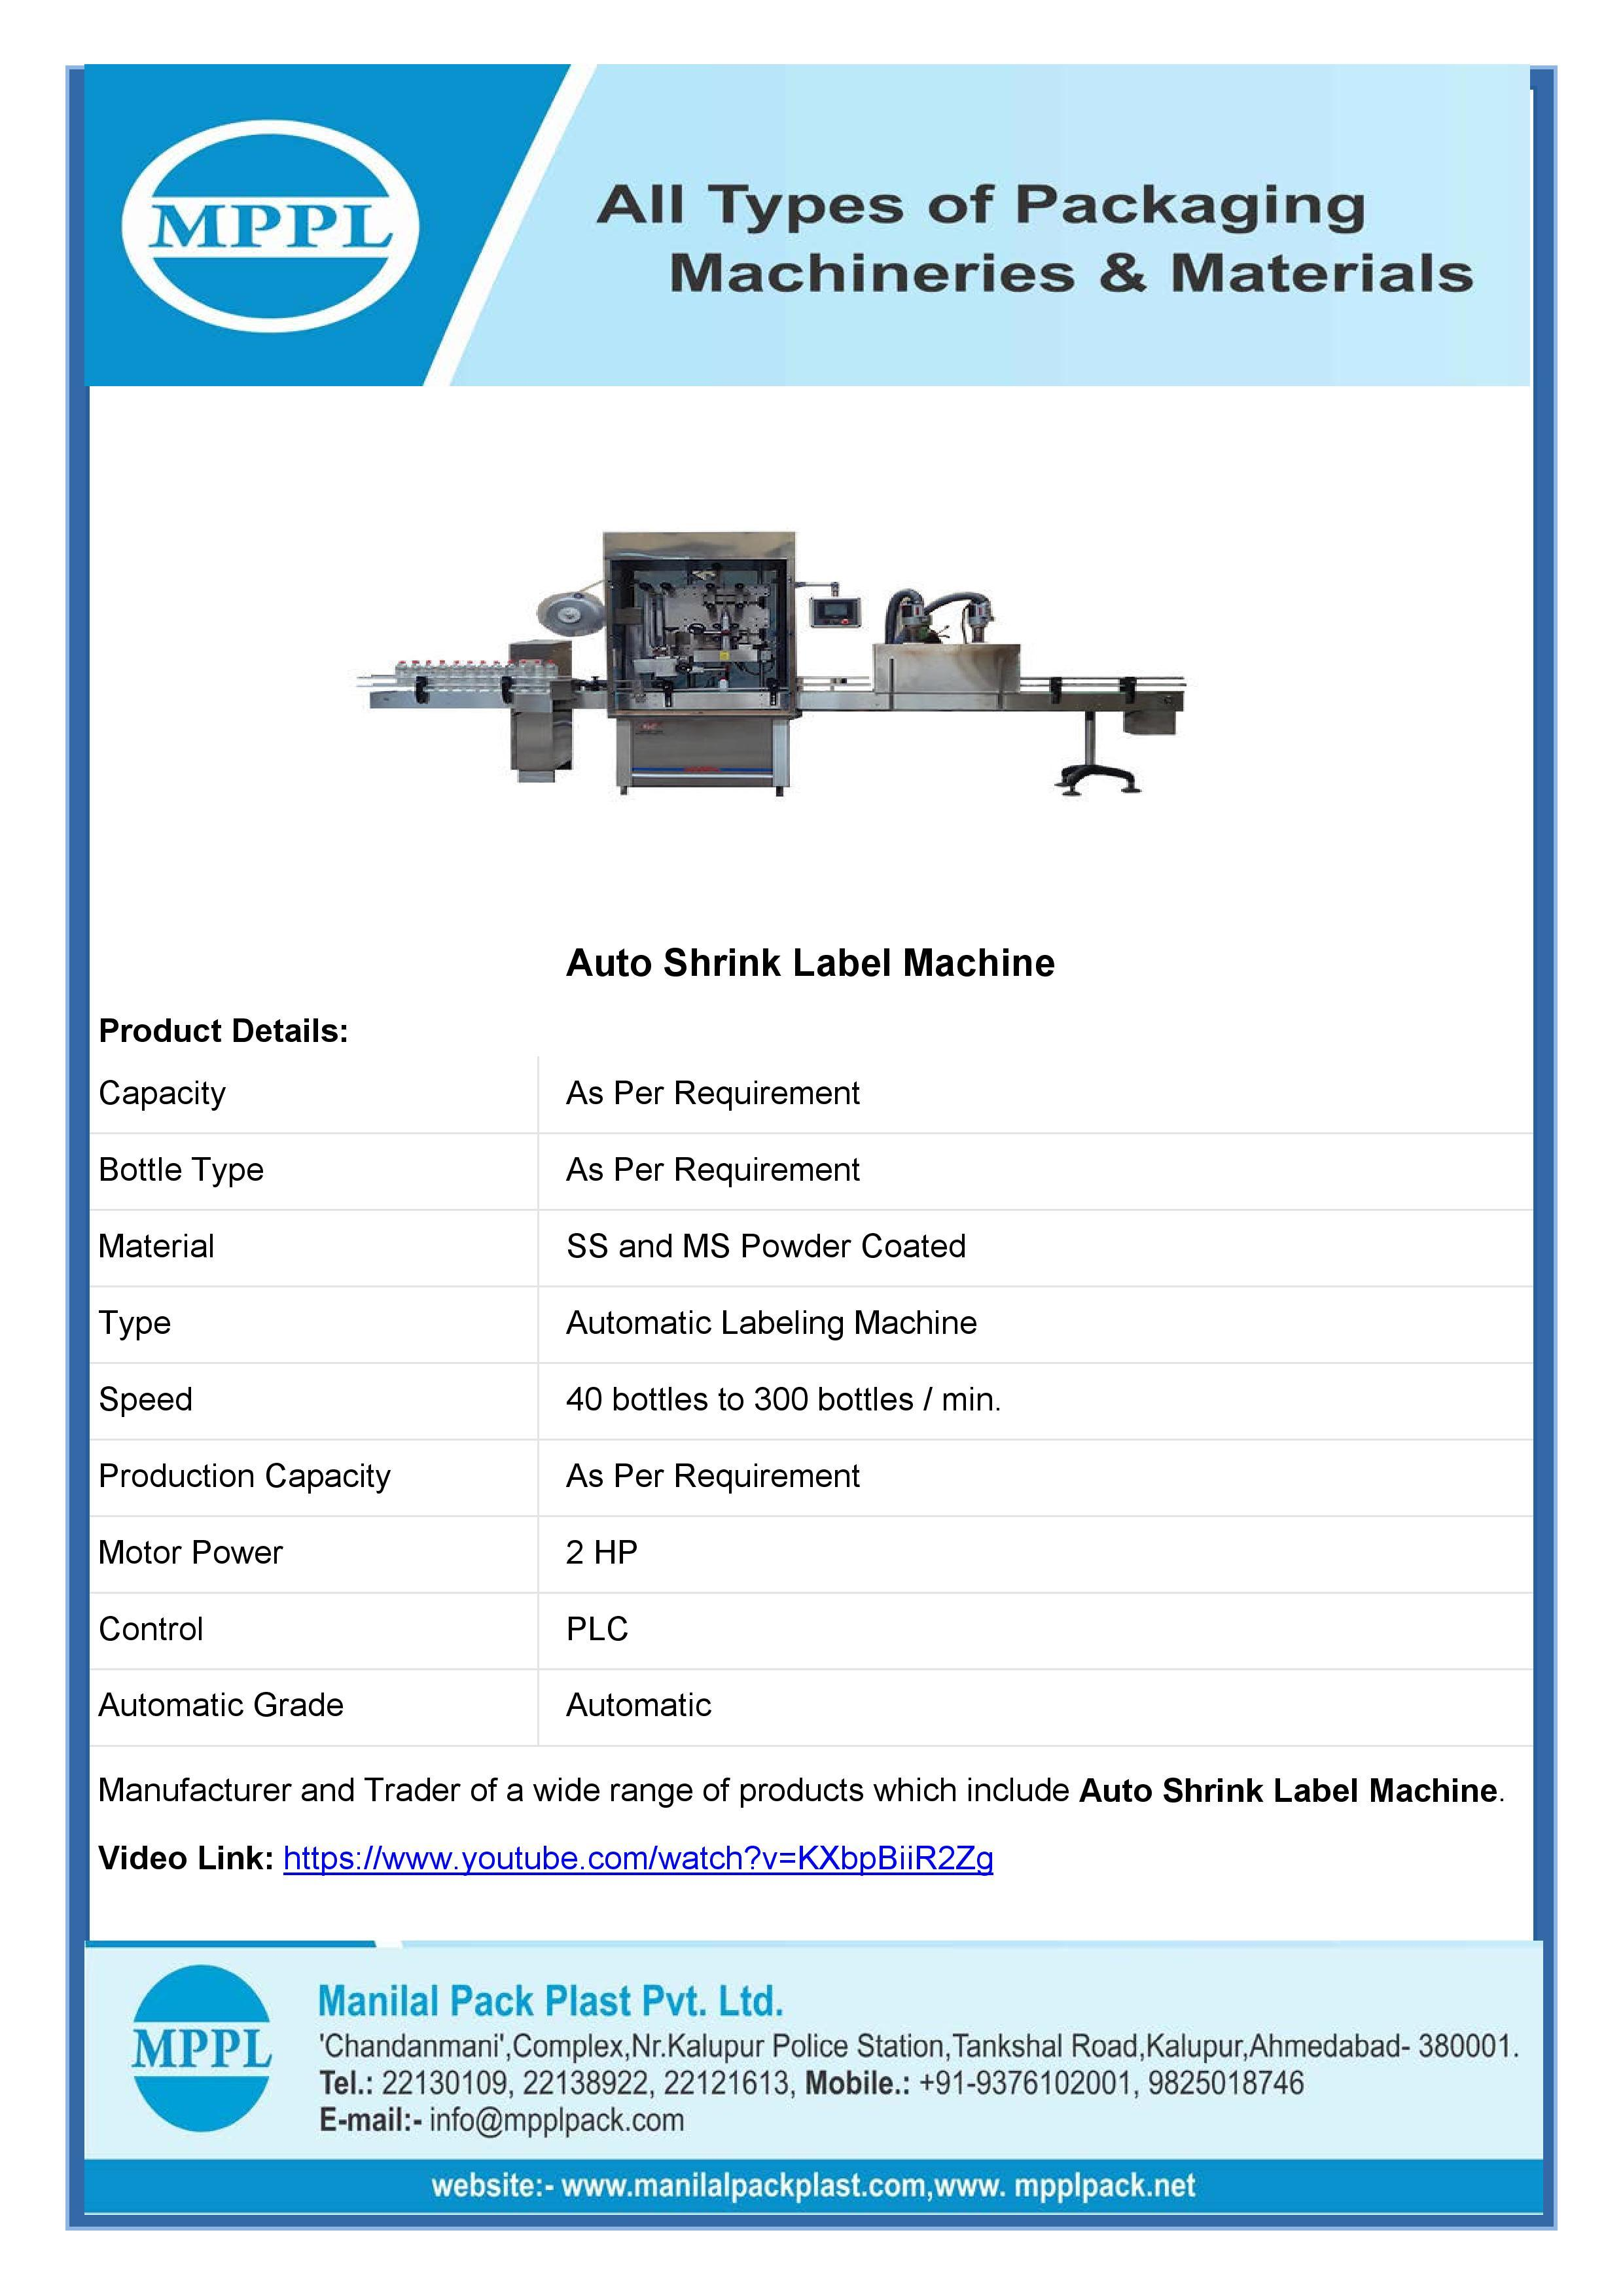 Auto Shrink Label Machine